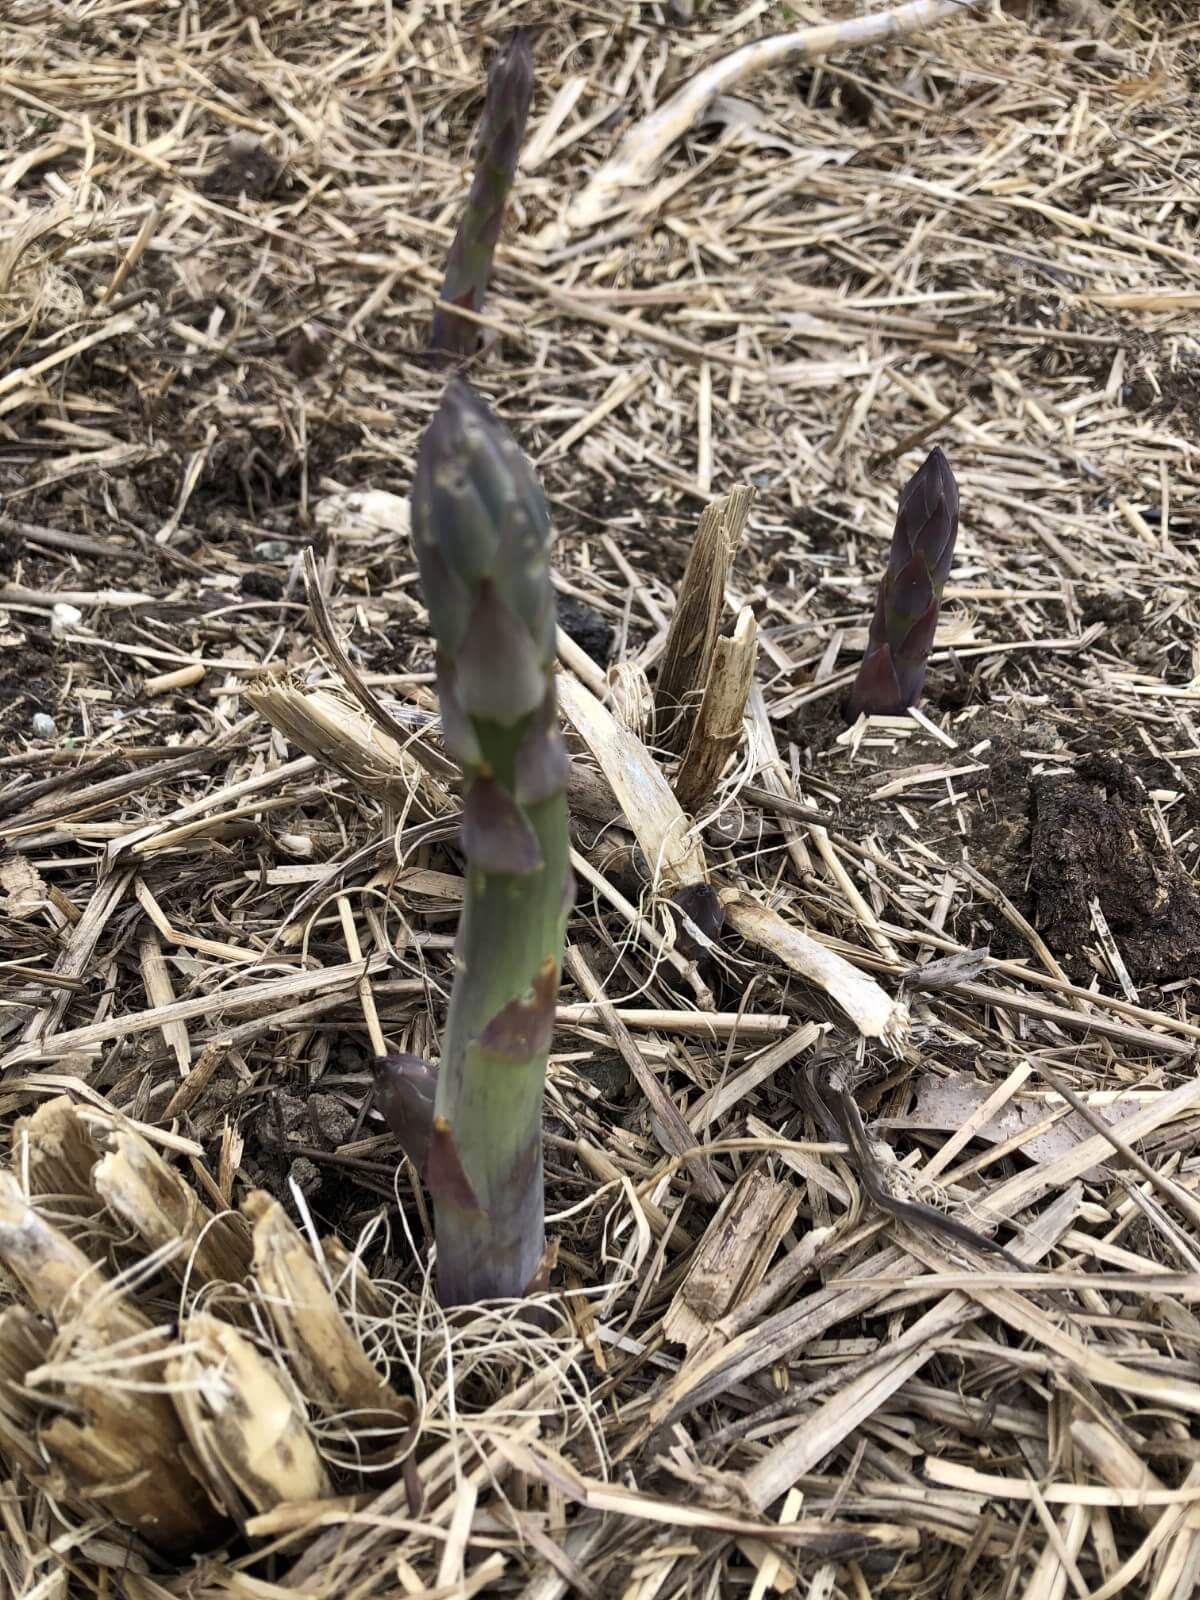 growing asparagus spears